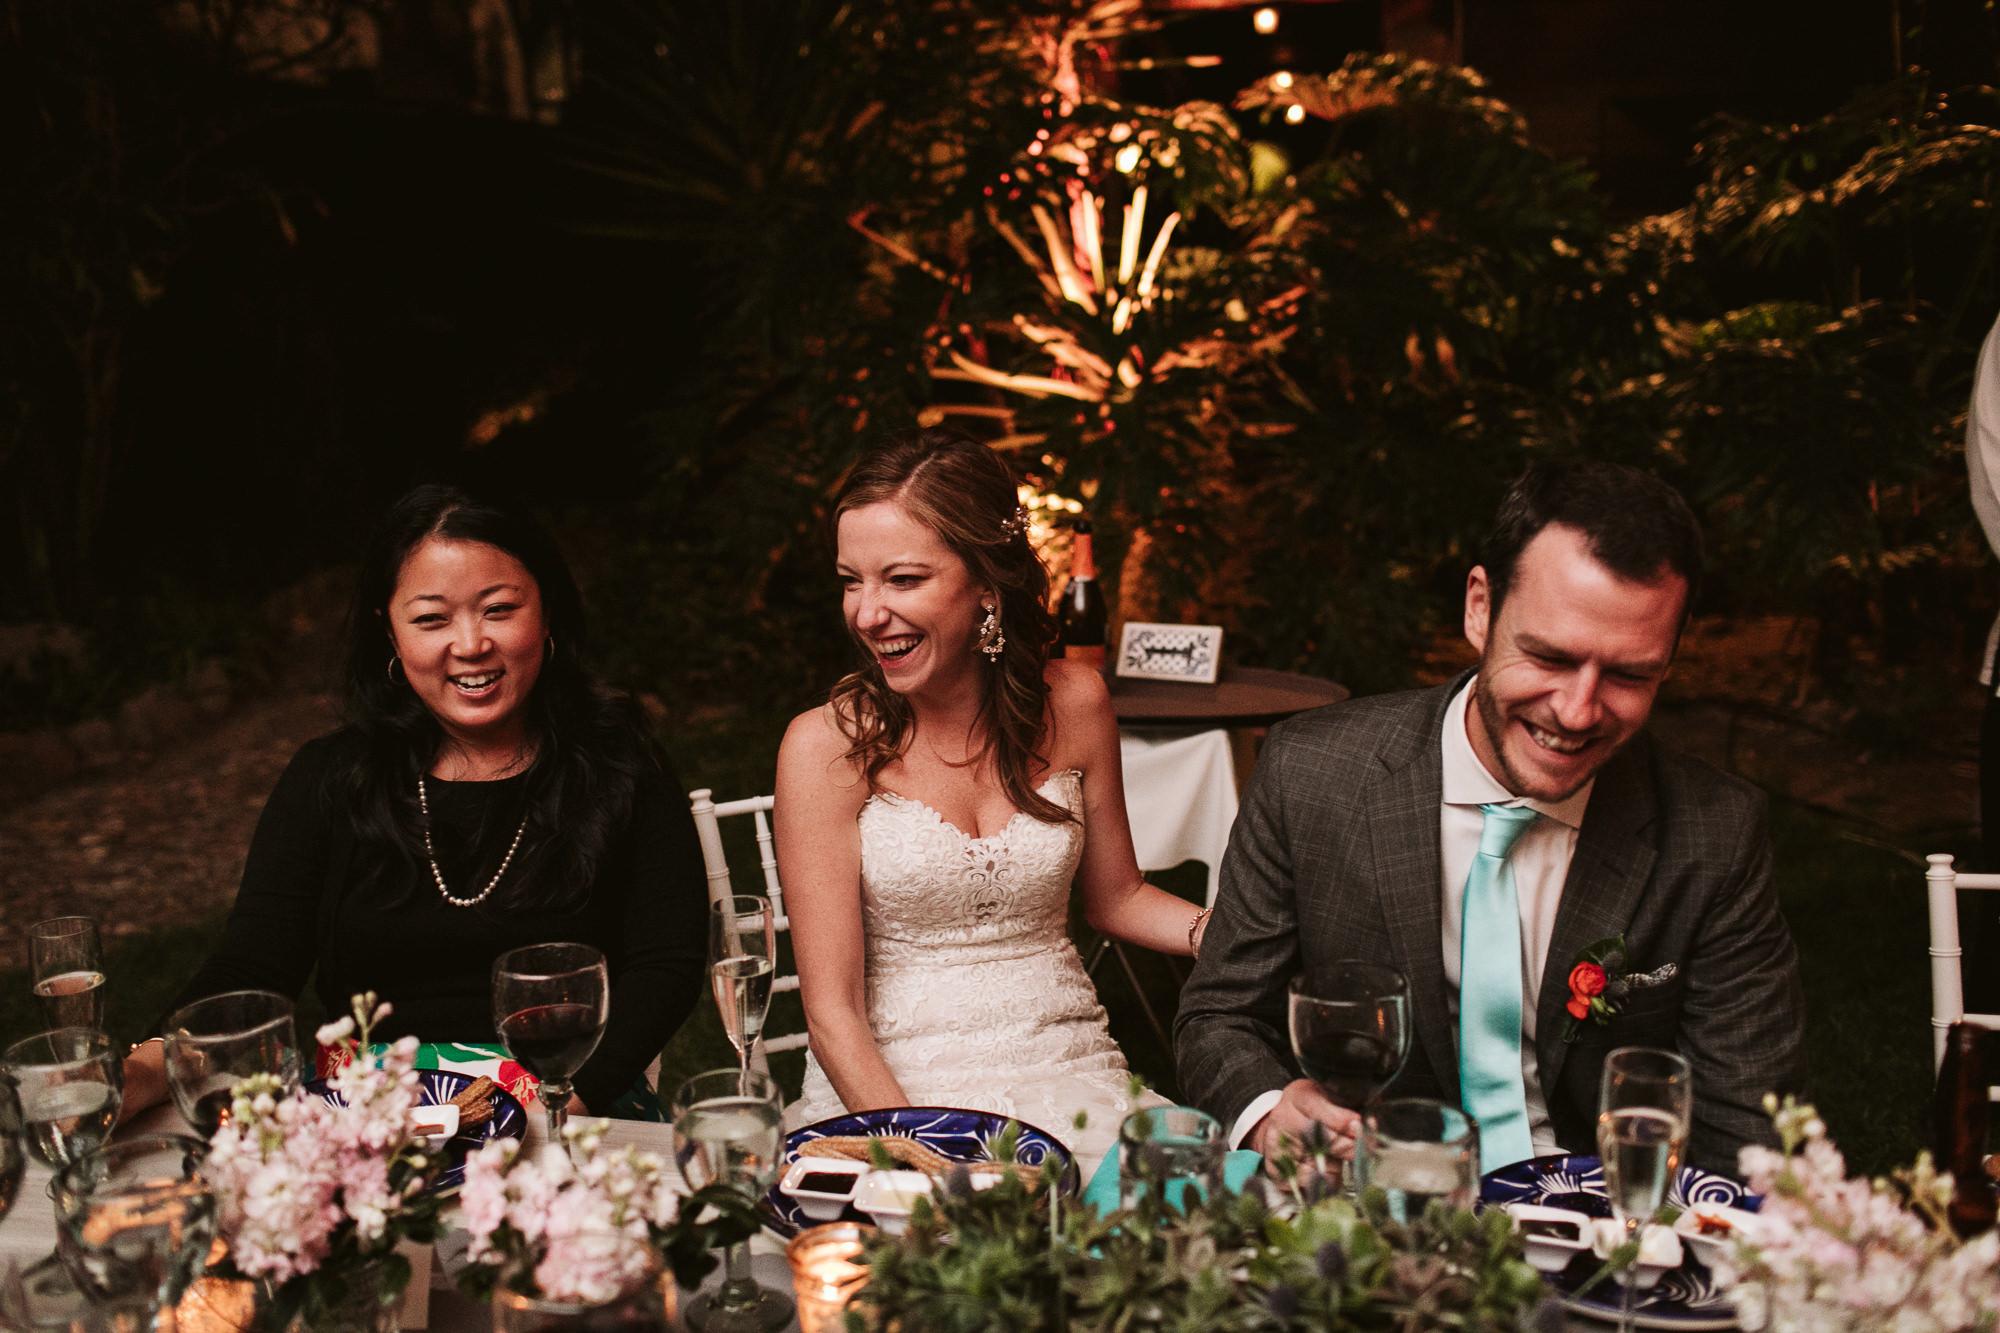 Destination-wedding-photographer-187.jpg